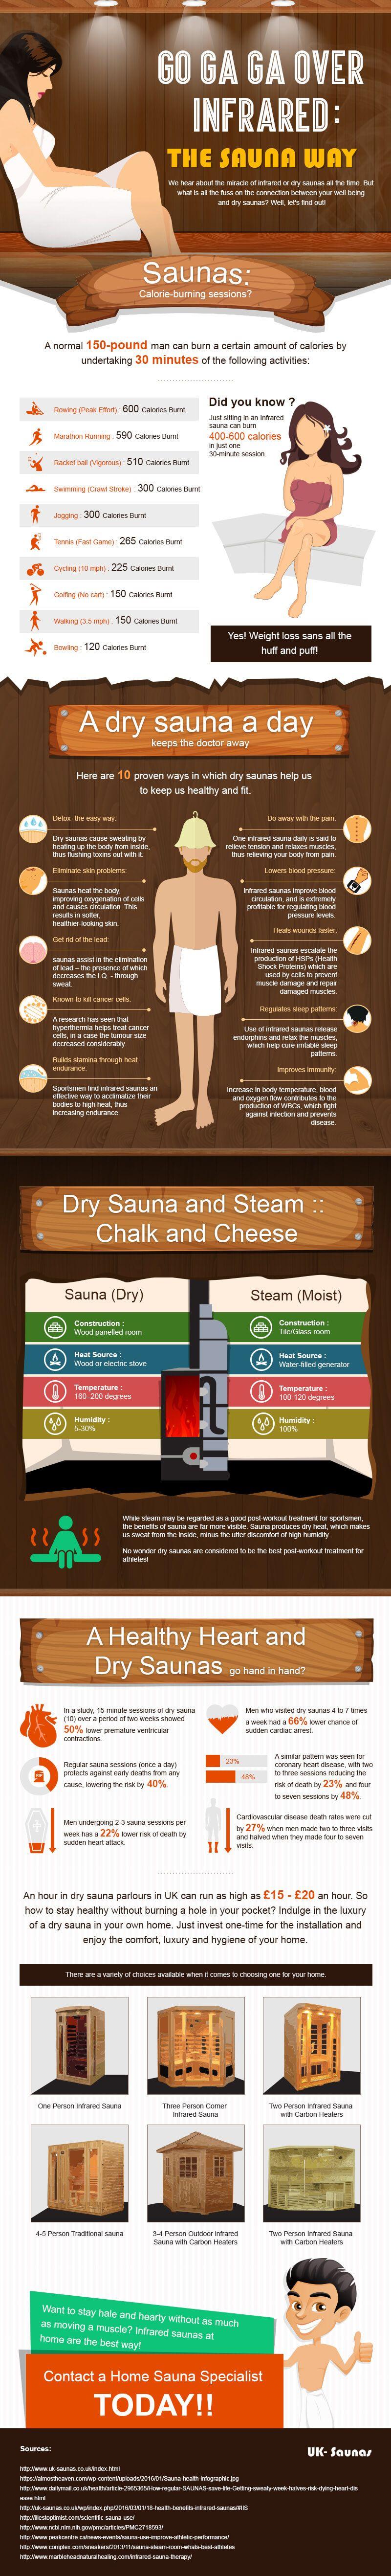 The Health Benefits Of Dry Saunas Sauna Benefits Dry Sauna Sauna